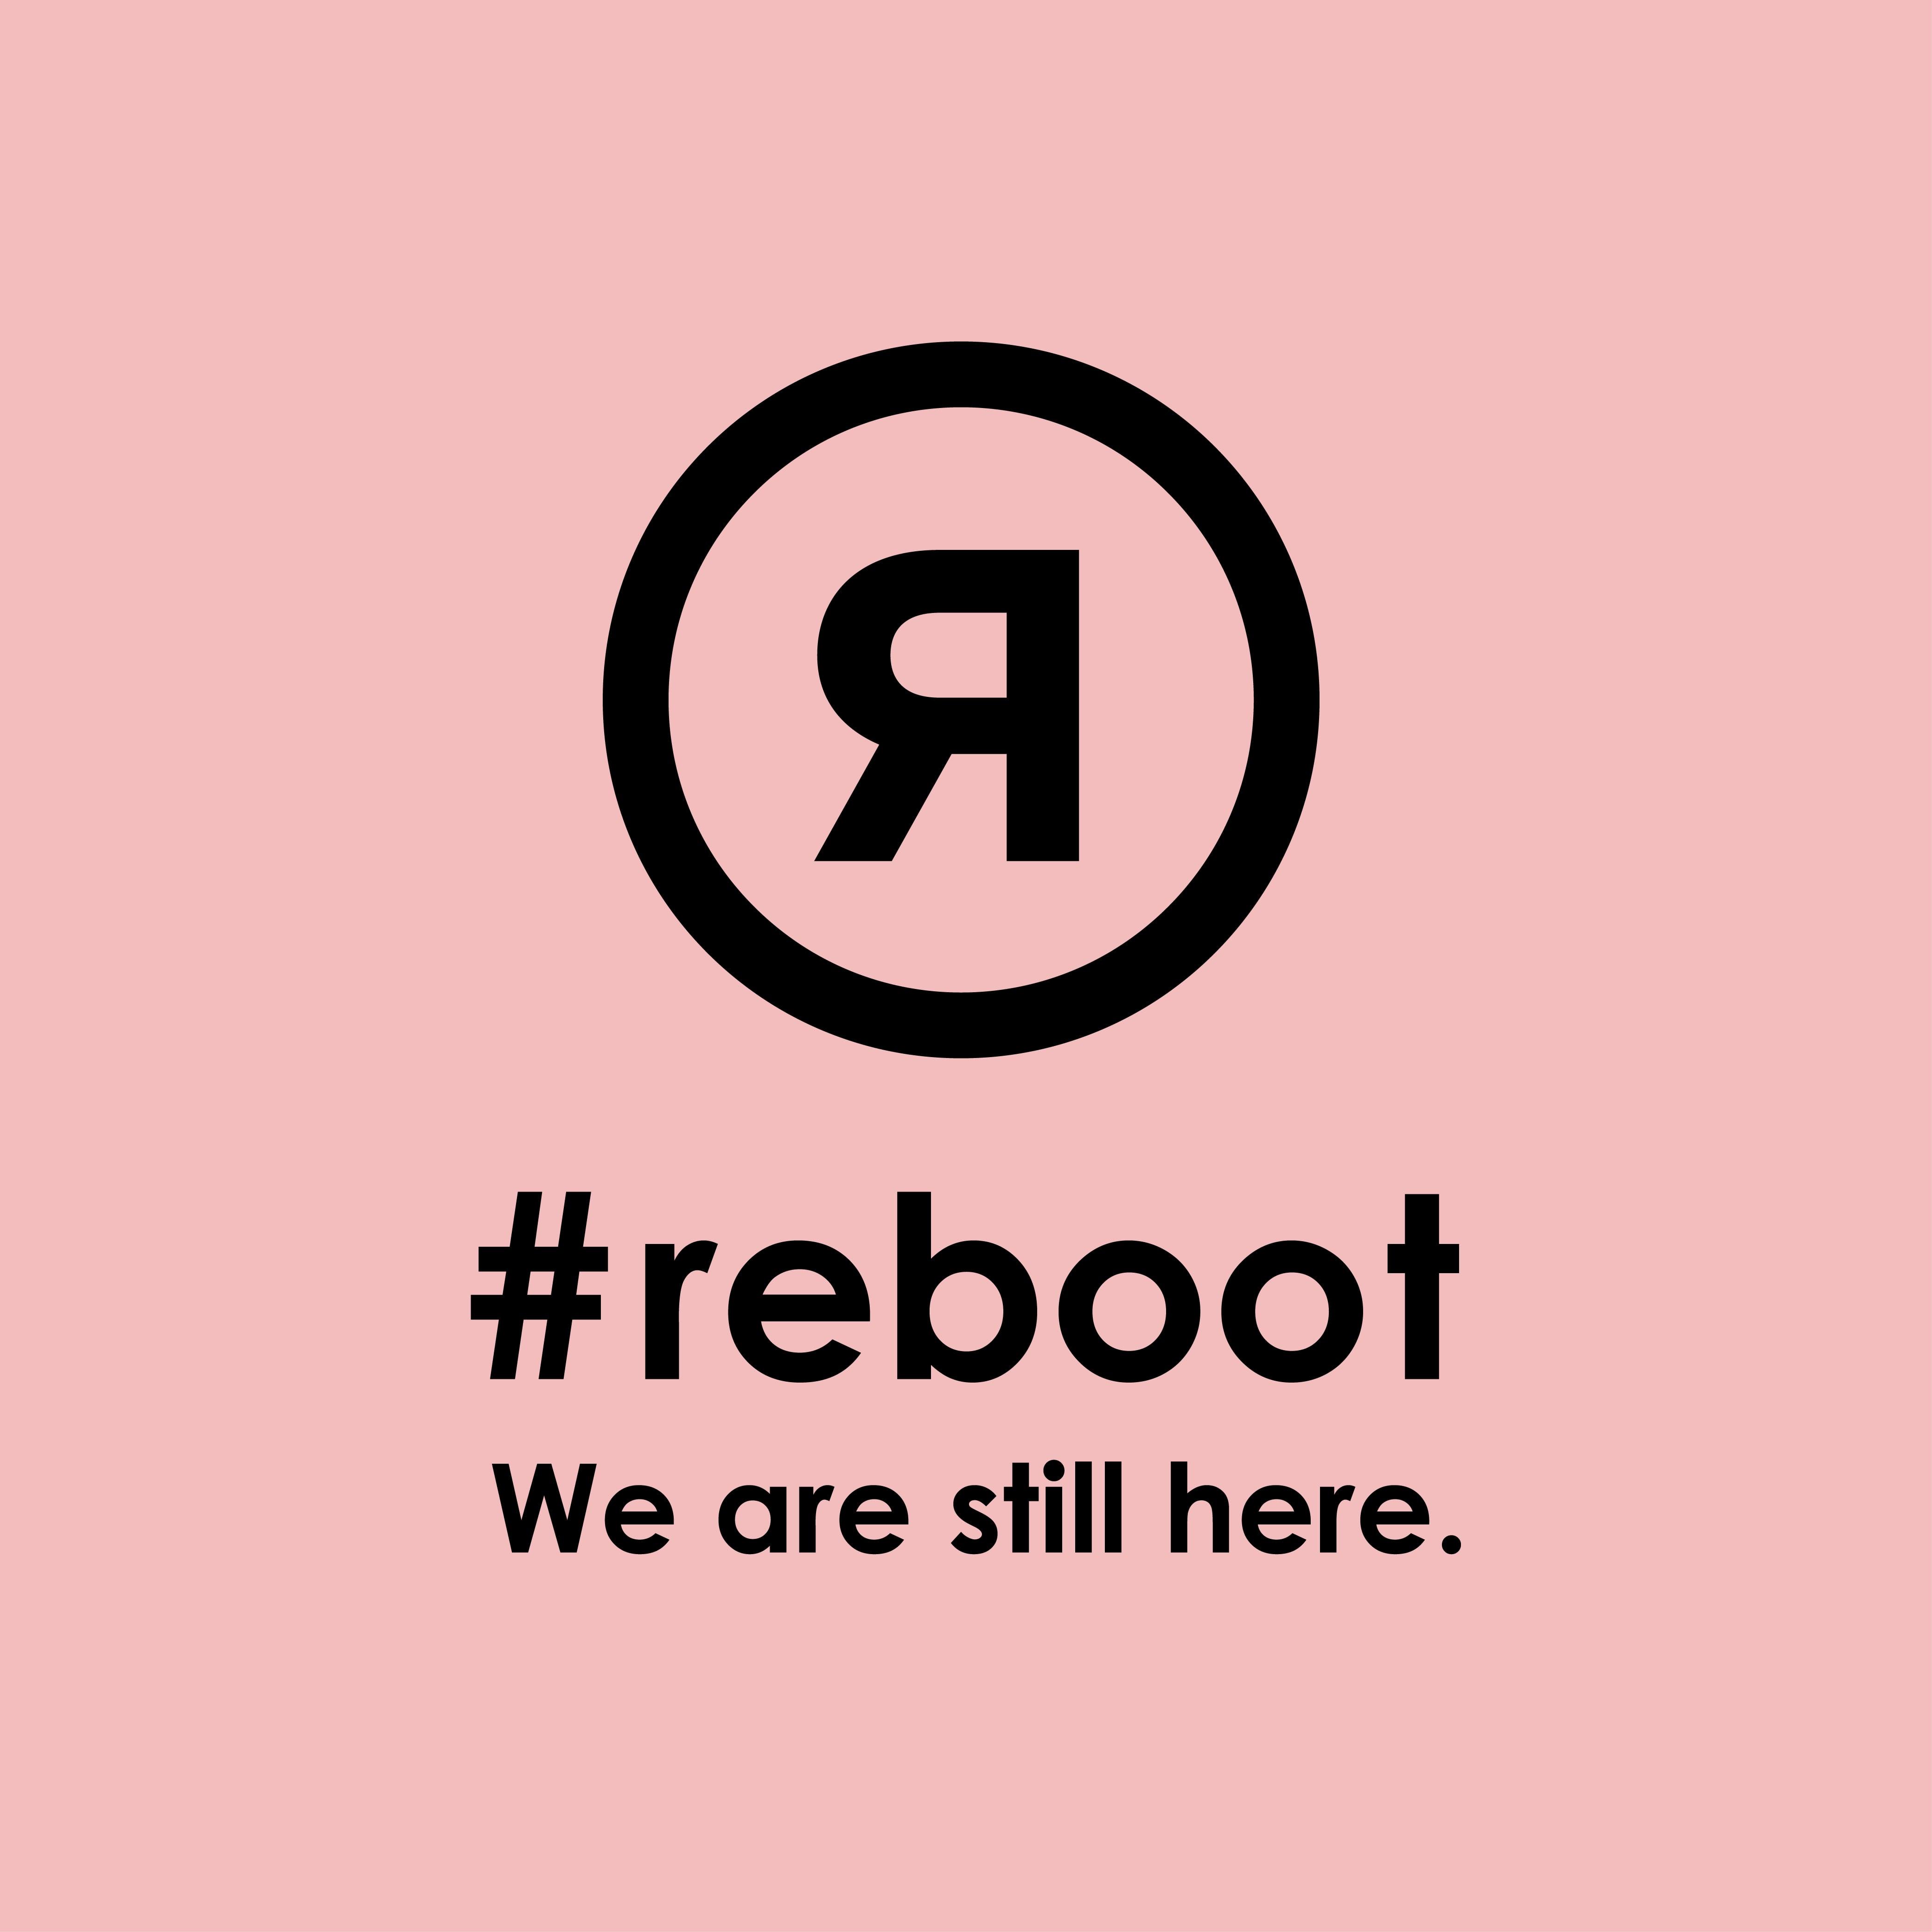 #rebootステッカー ピンク